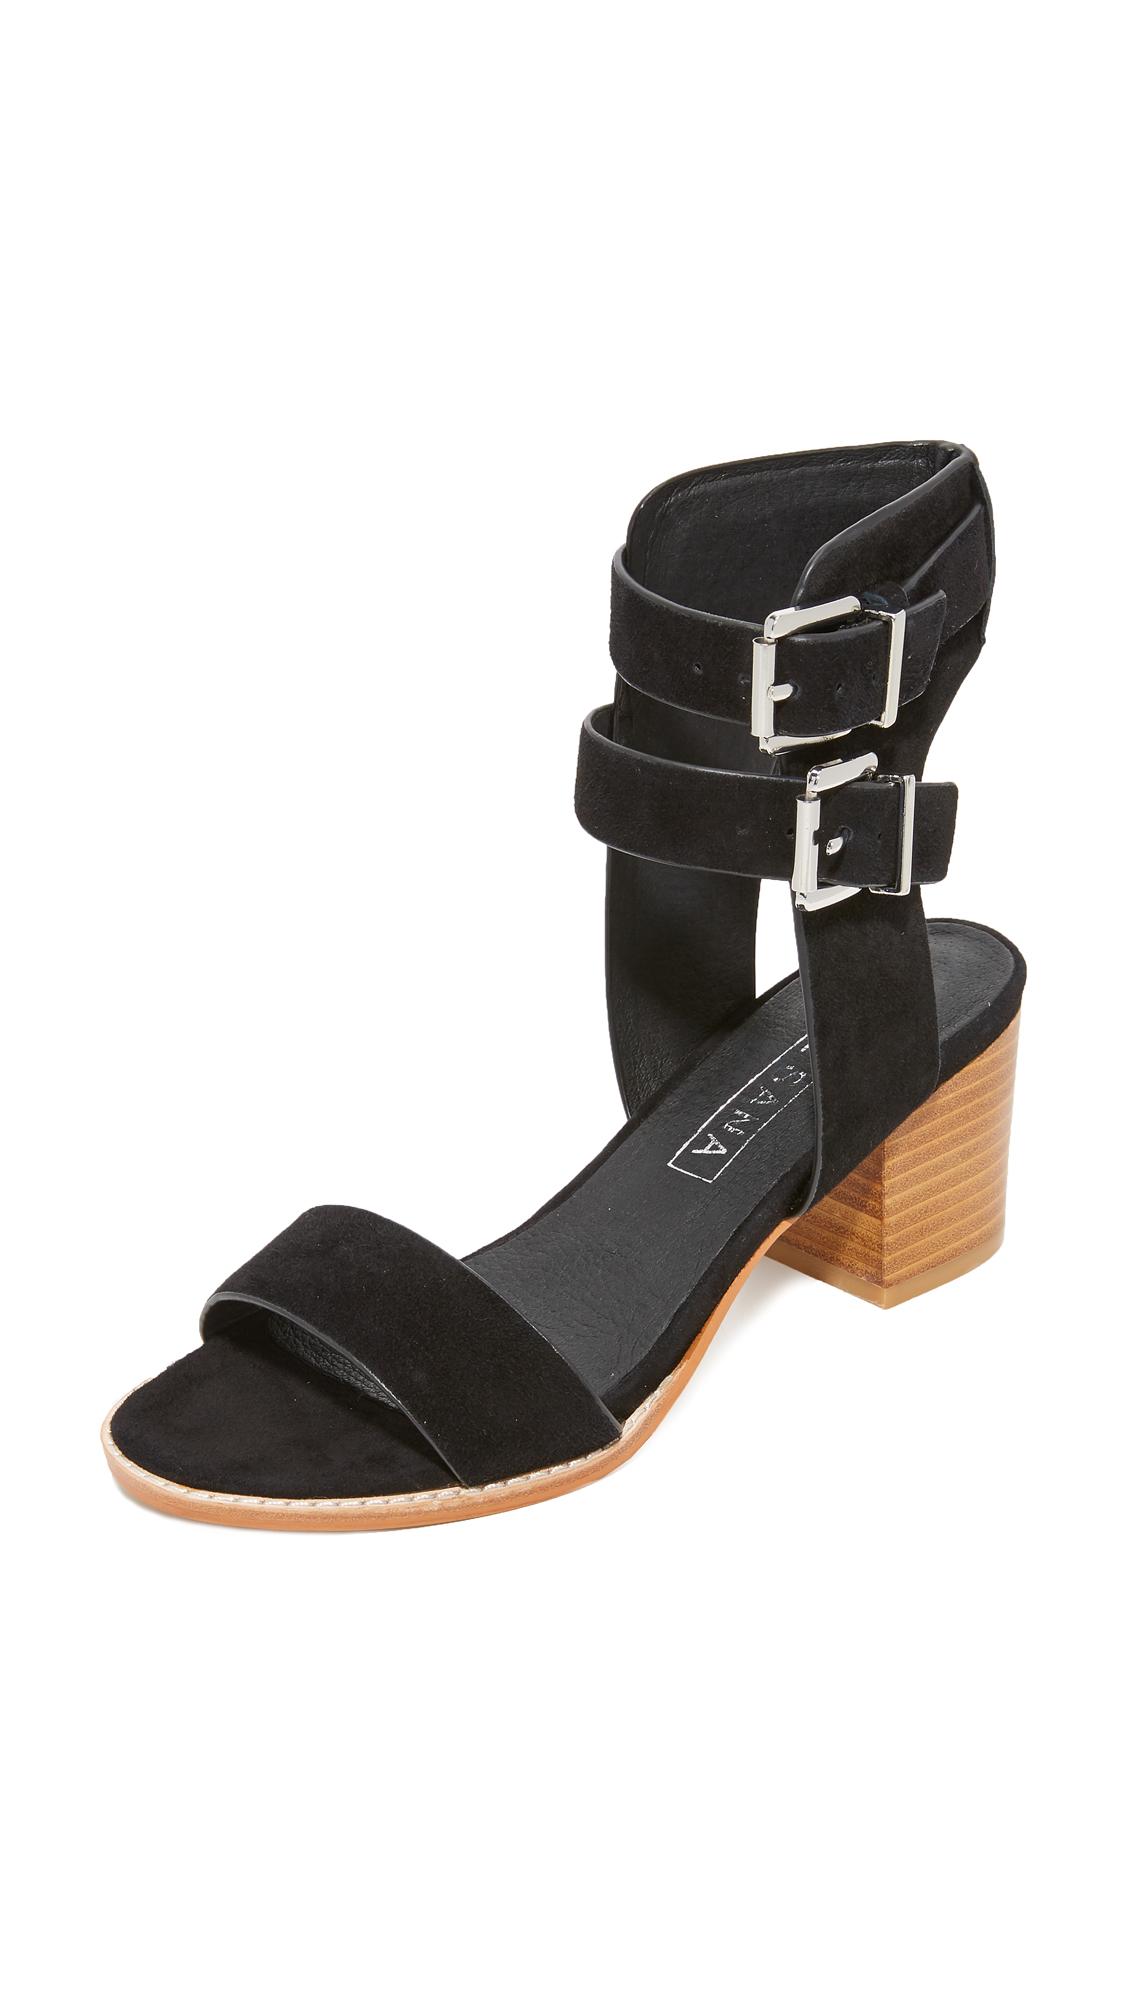 Sol Sana Porter Heel City Sandals - Black